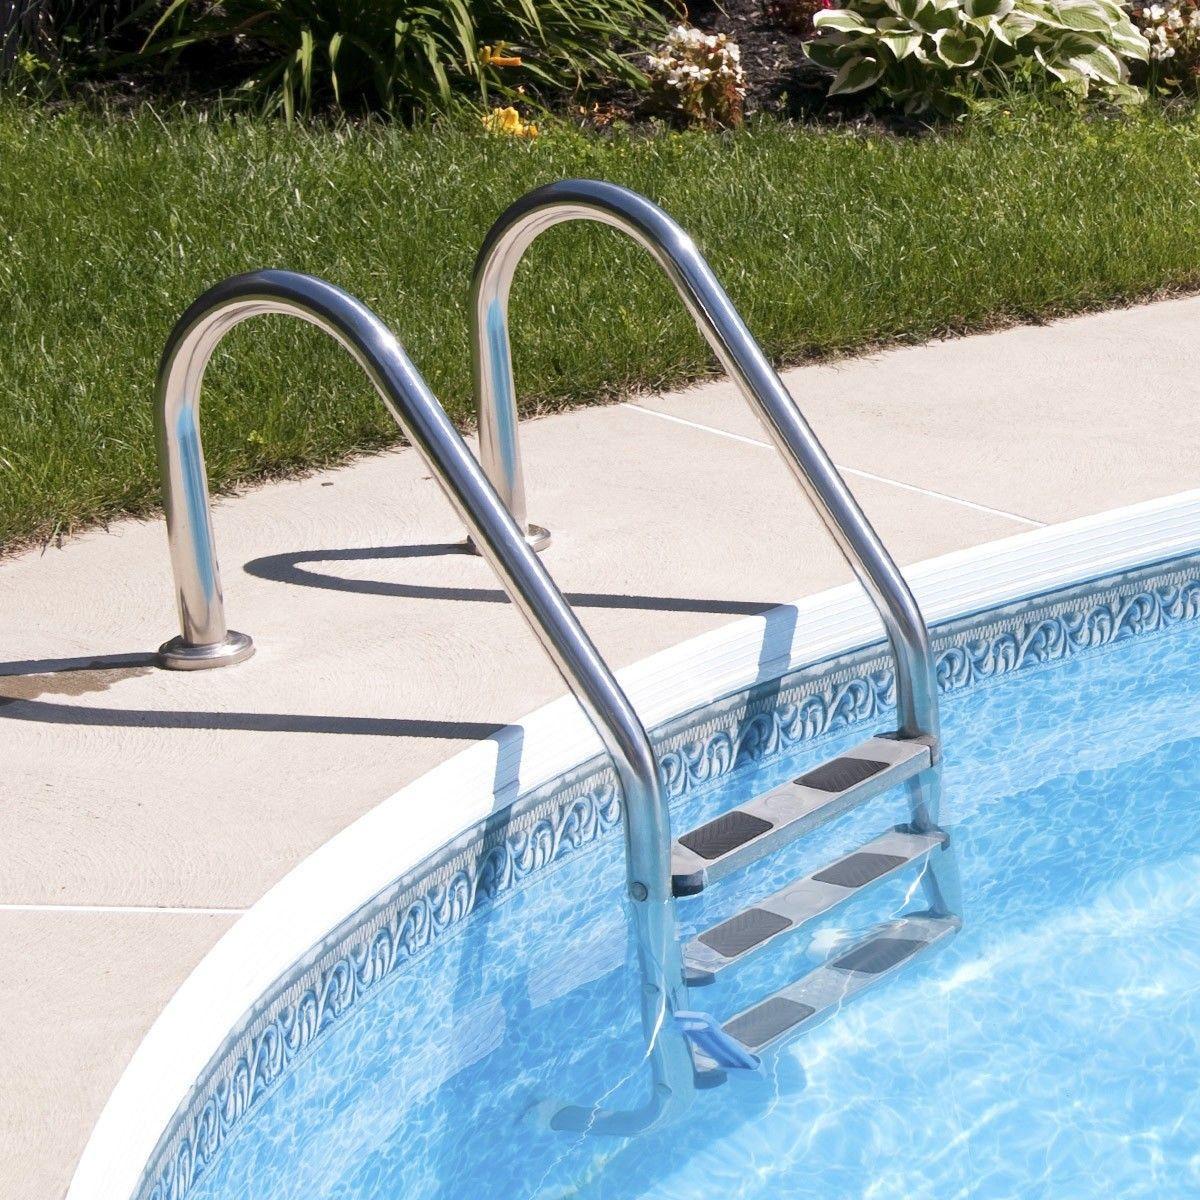 3 Steps Stainless Steel In Ground Swimming Pool Ladder Pool Ladder Swimming Pool Ladders Above Ground Pool Steps